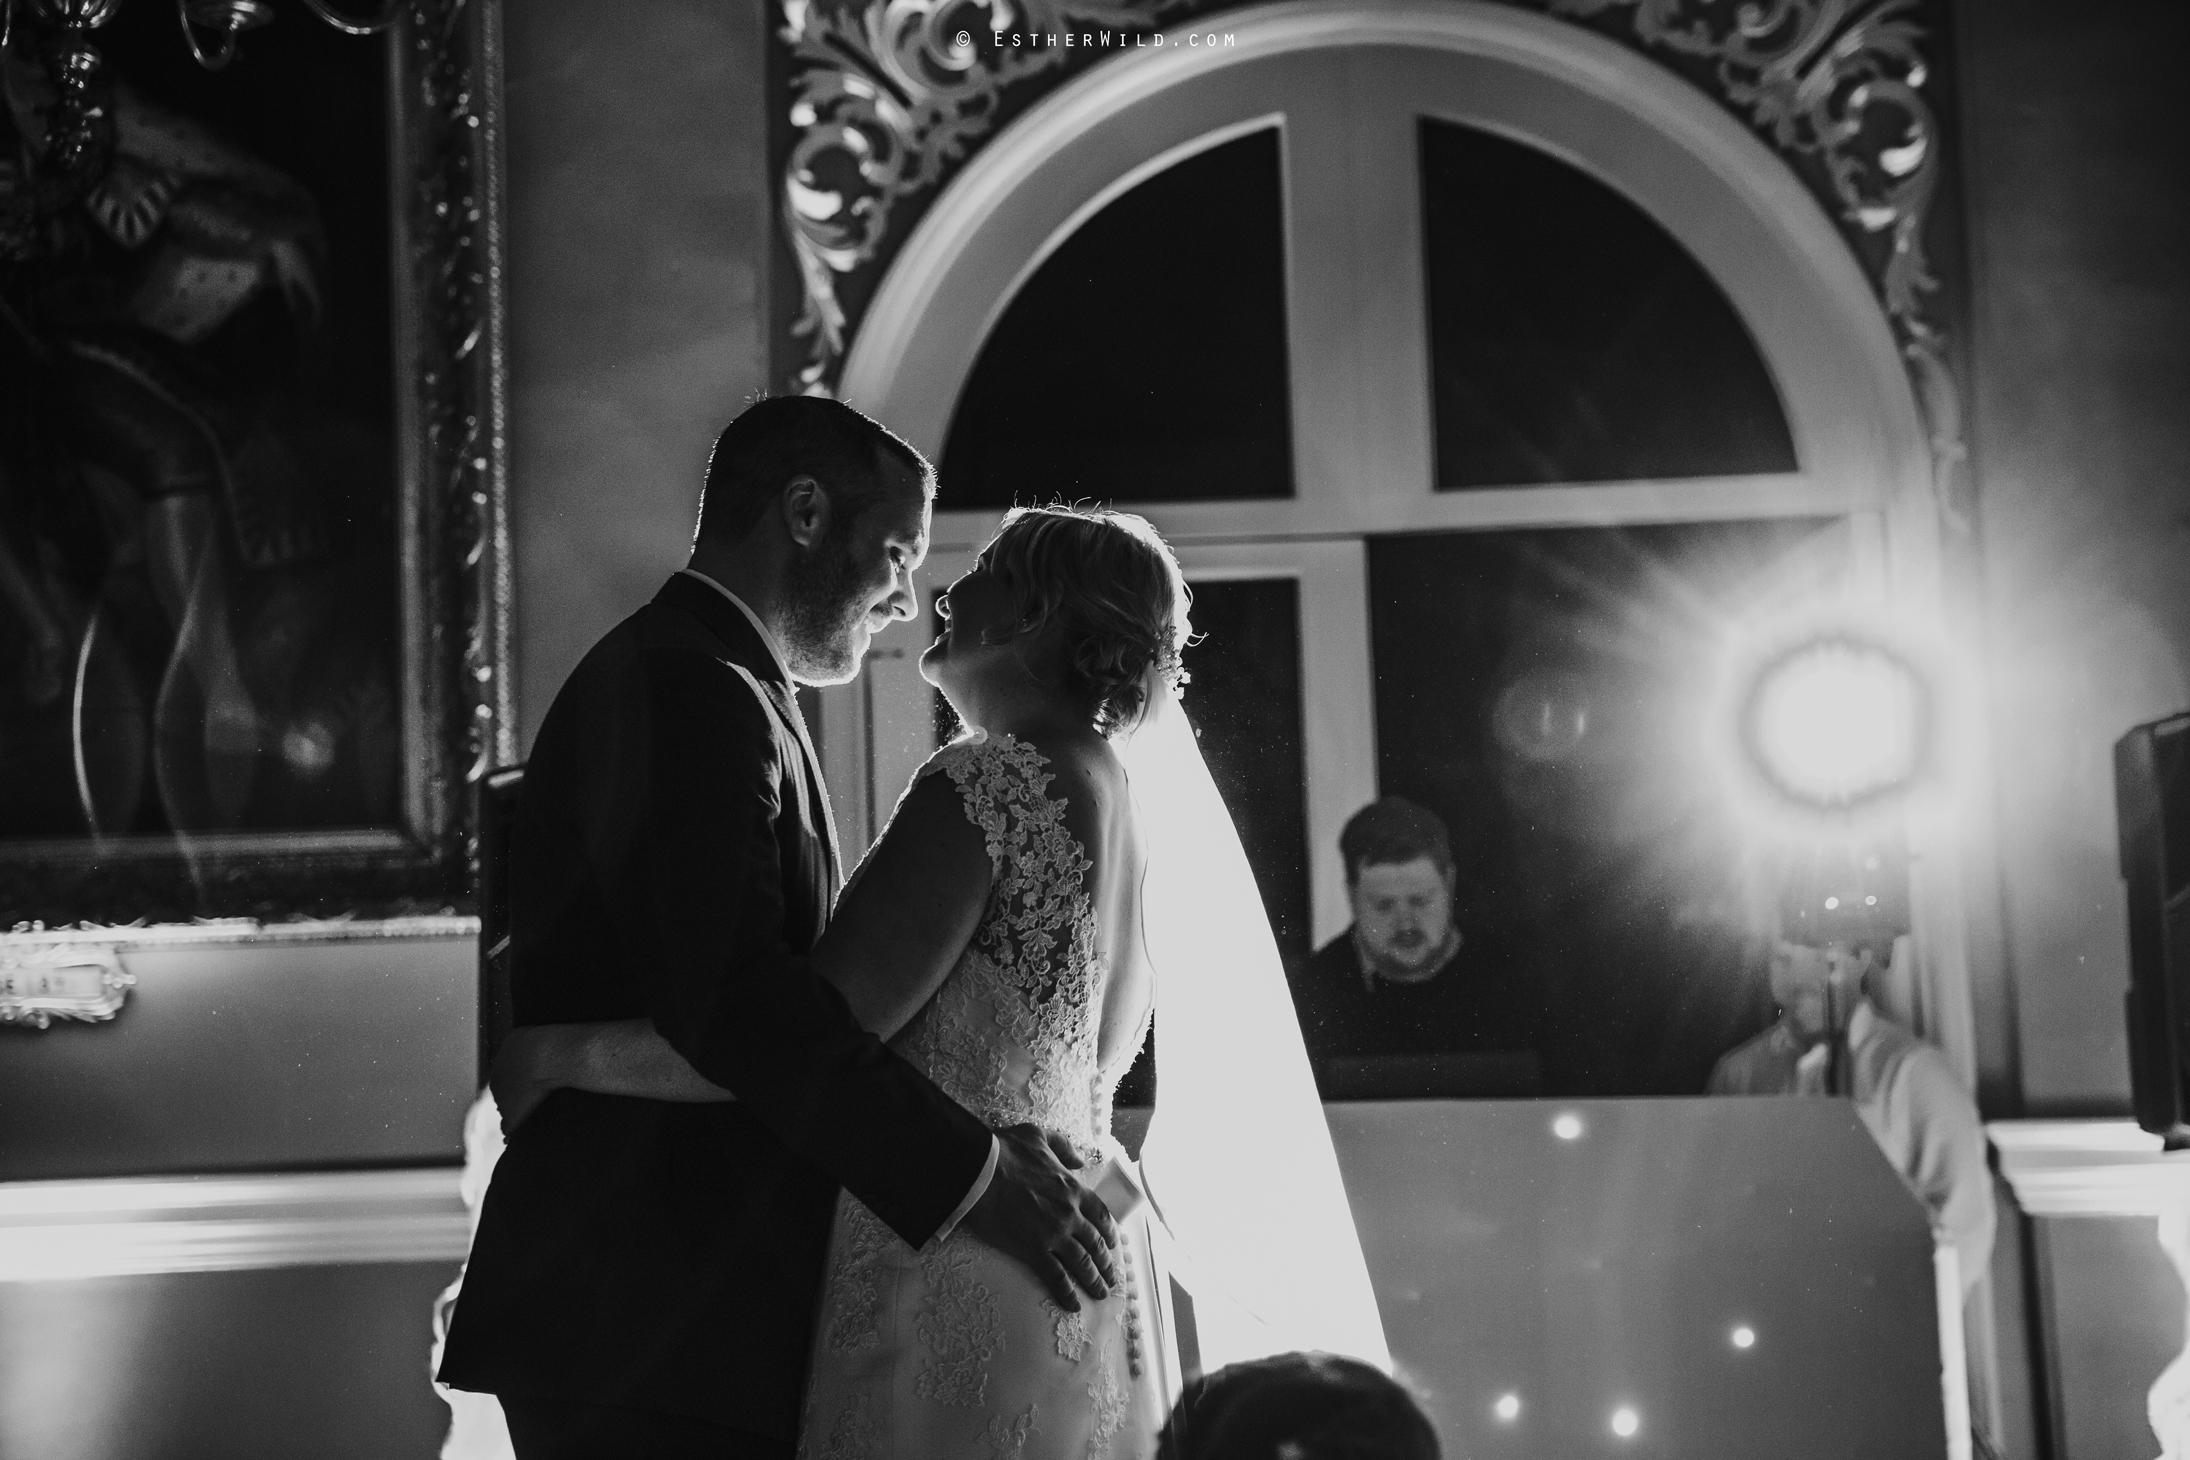 Wedding_Kings_Lynn_Town_Hall_Norfolk_Photographer_Esther_Wild_IMG_1825_IMGL0770-2.jpg